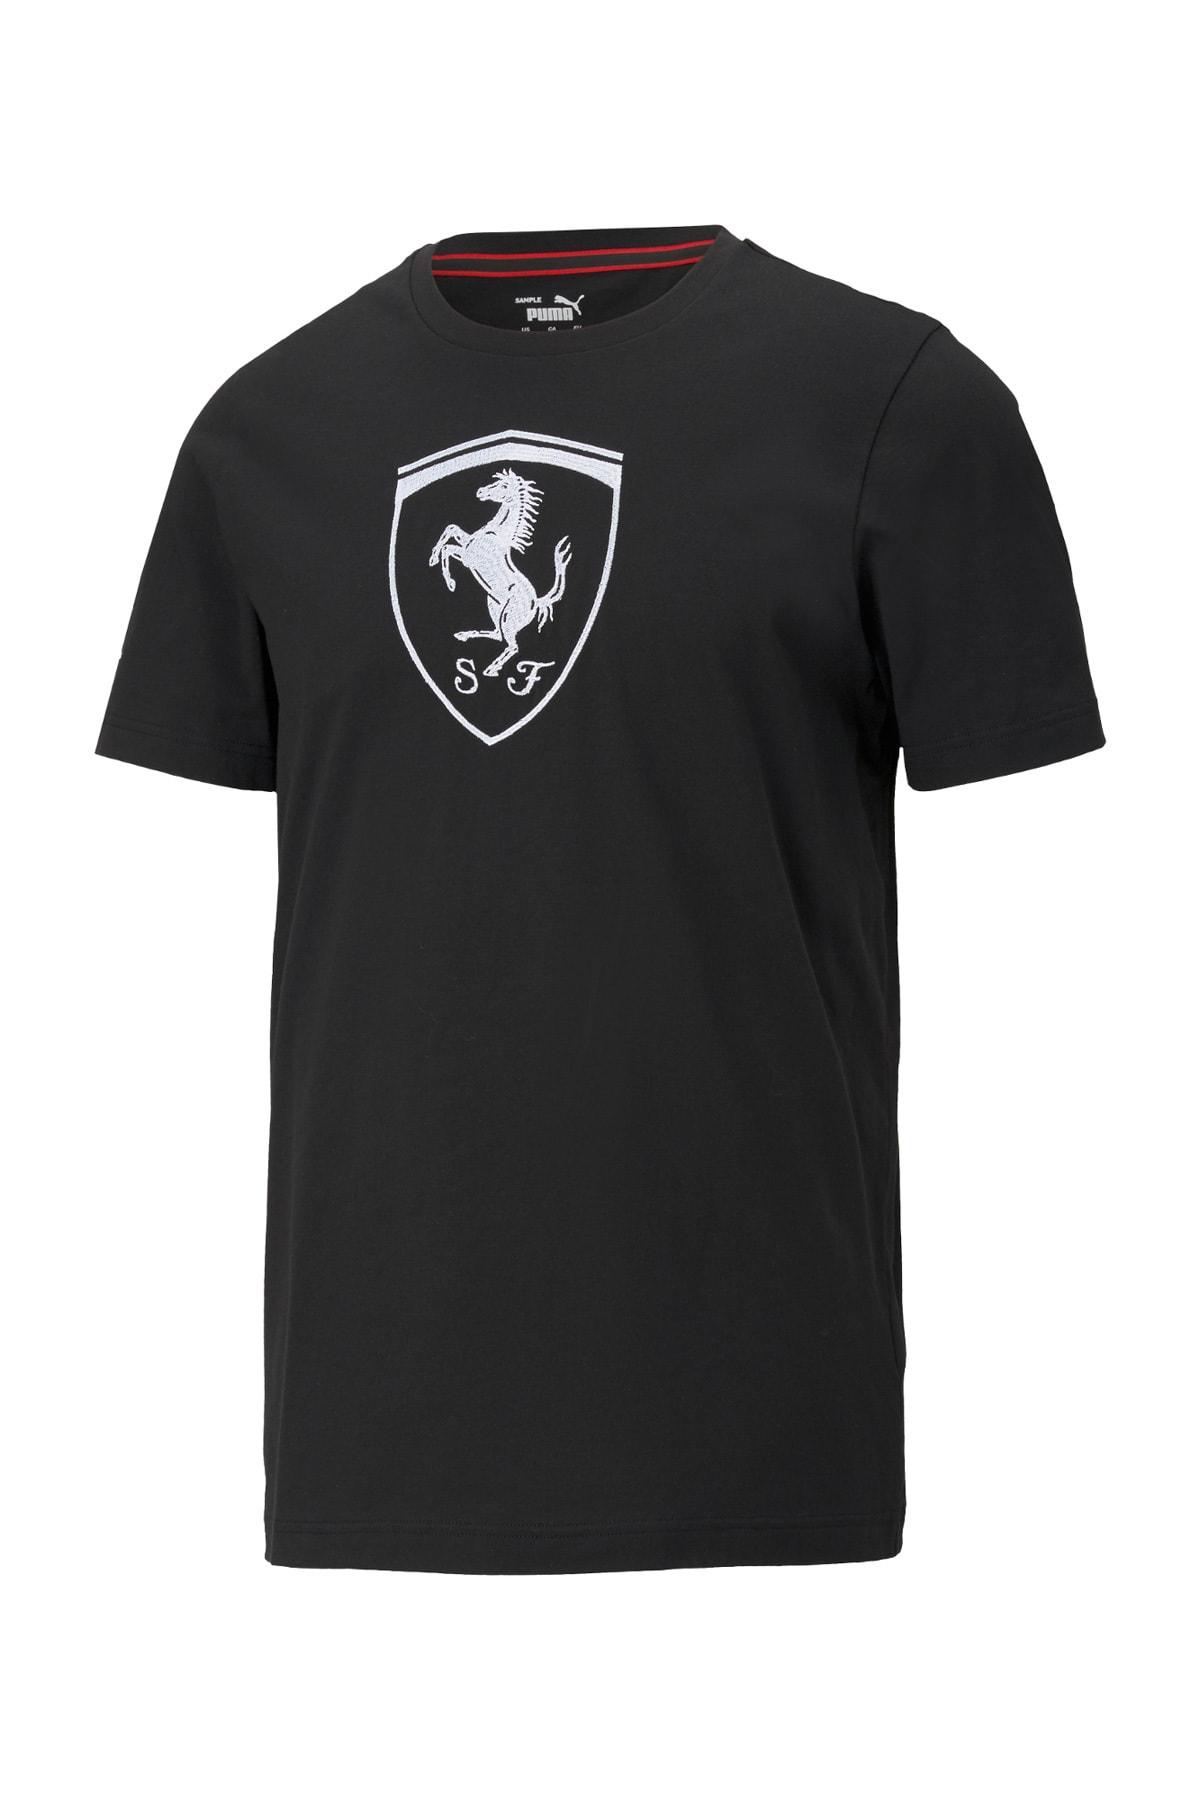 FERRARI RACE BIG SHIELD T Siyah Erkek T-Shirt 101085593